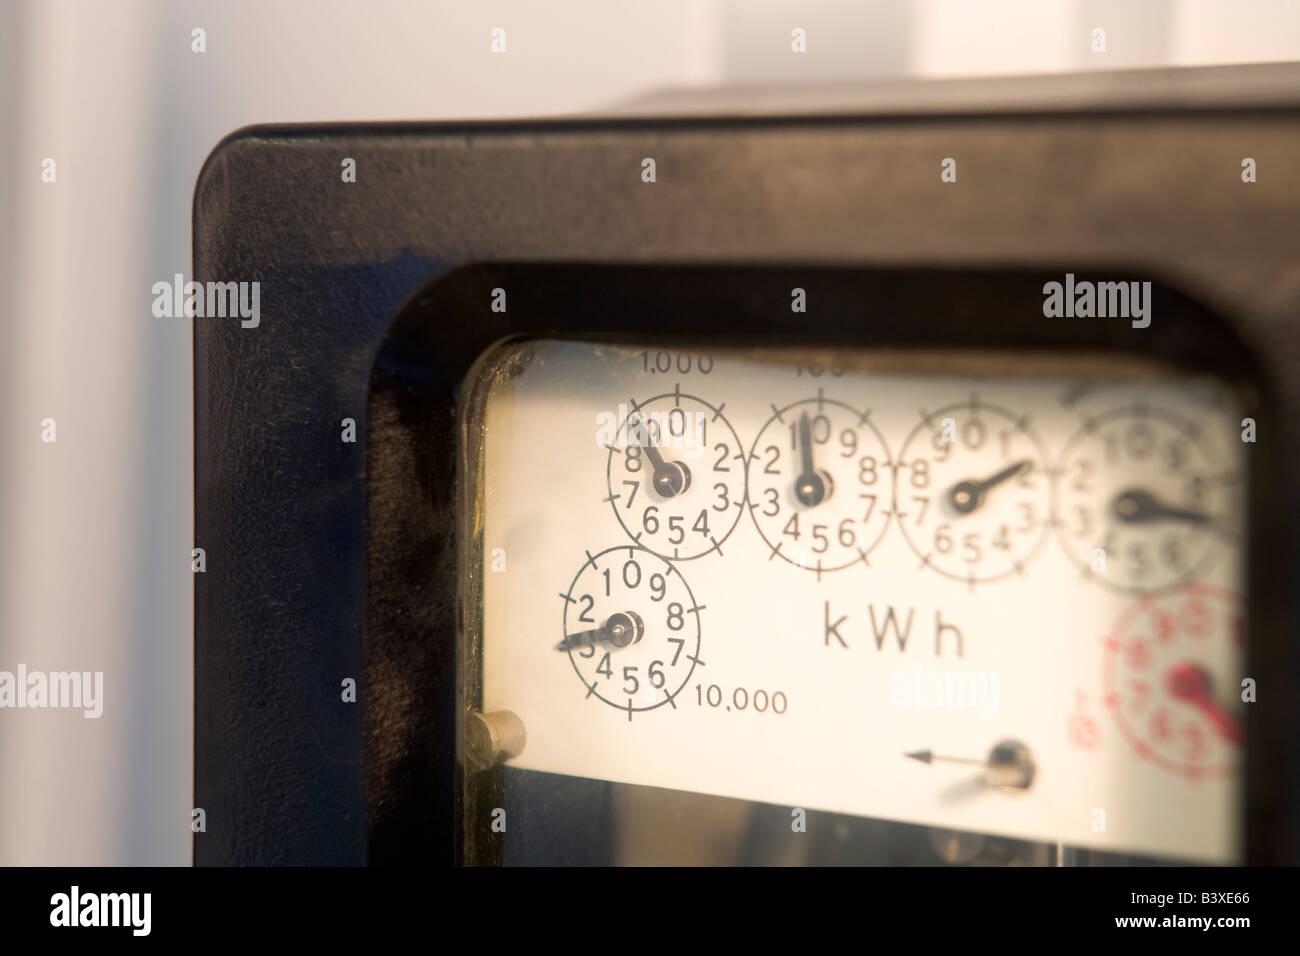 Electric Meter - Stock Image